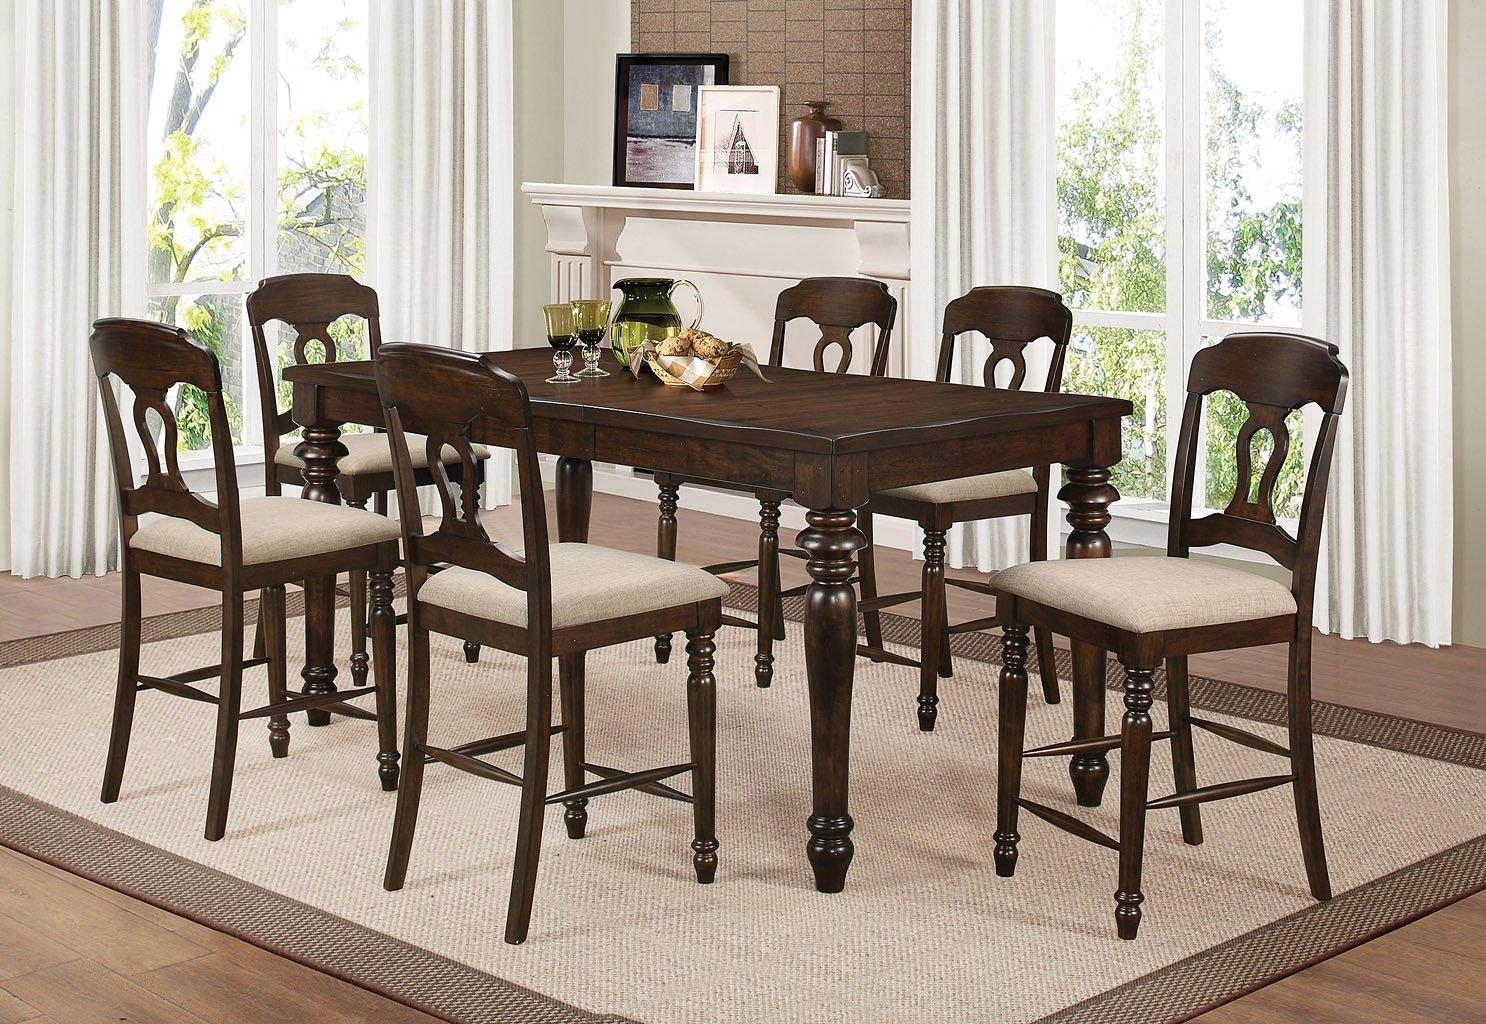 Hamilton Counter Height Dining Room Set Coaster Furniture